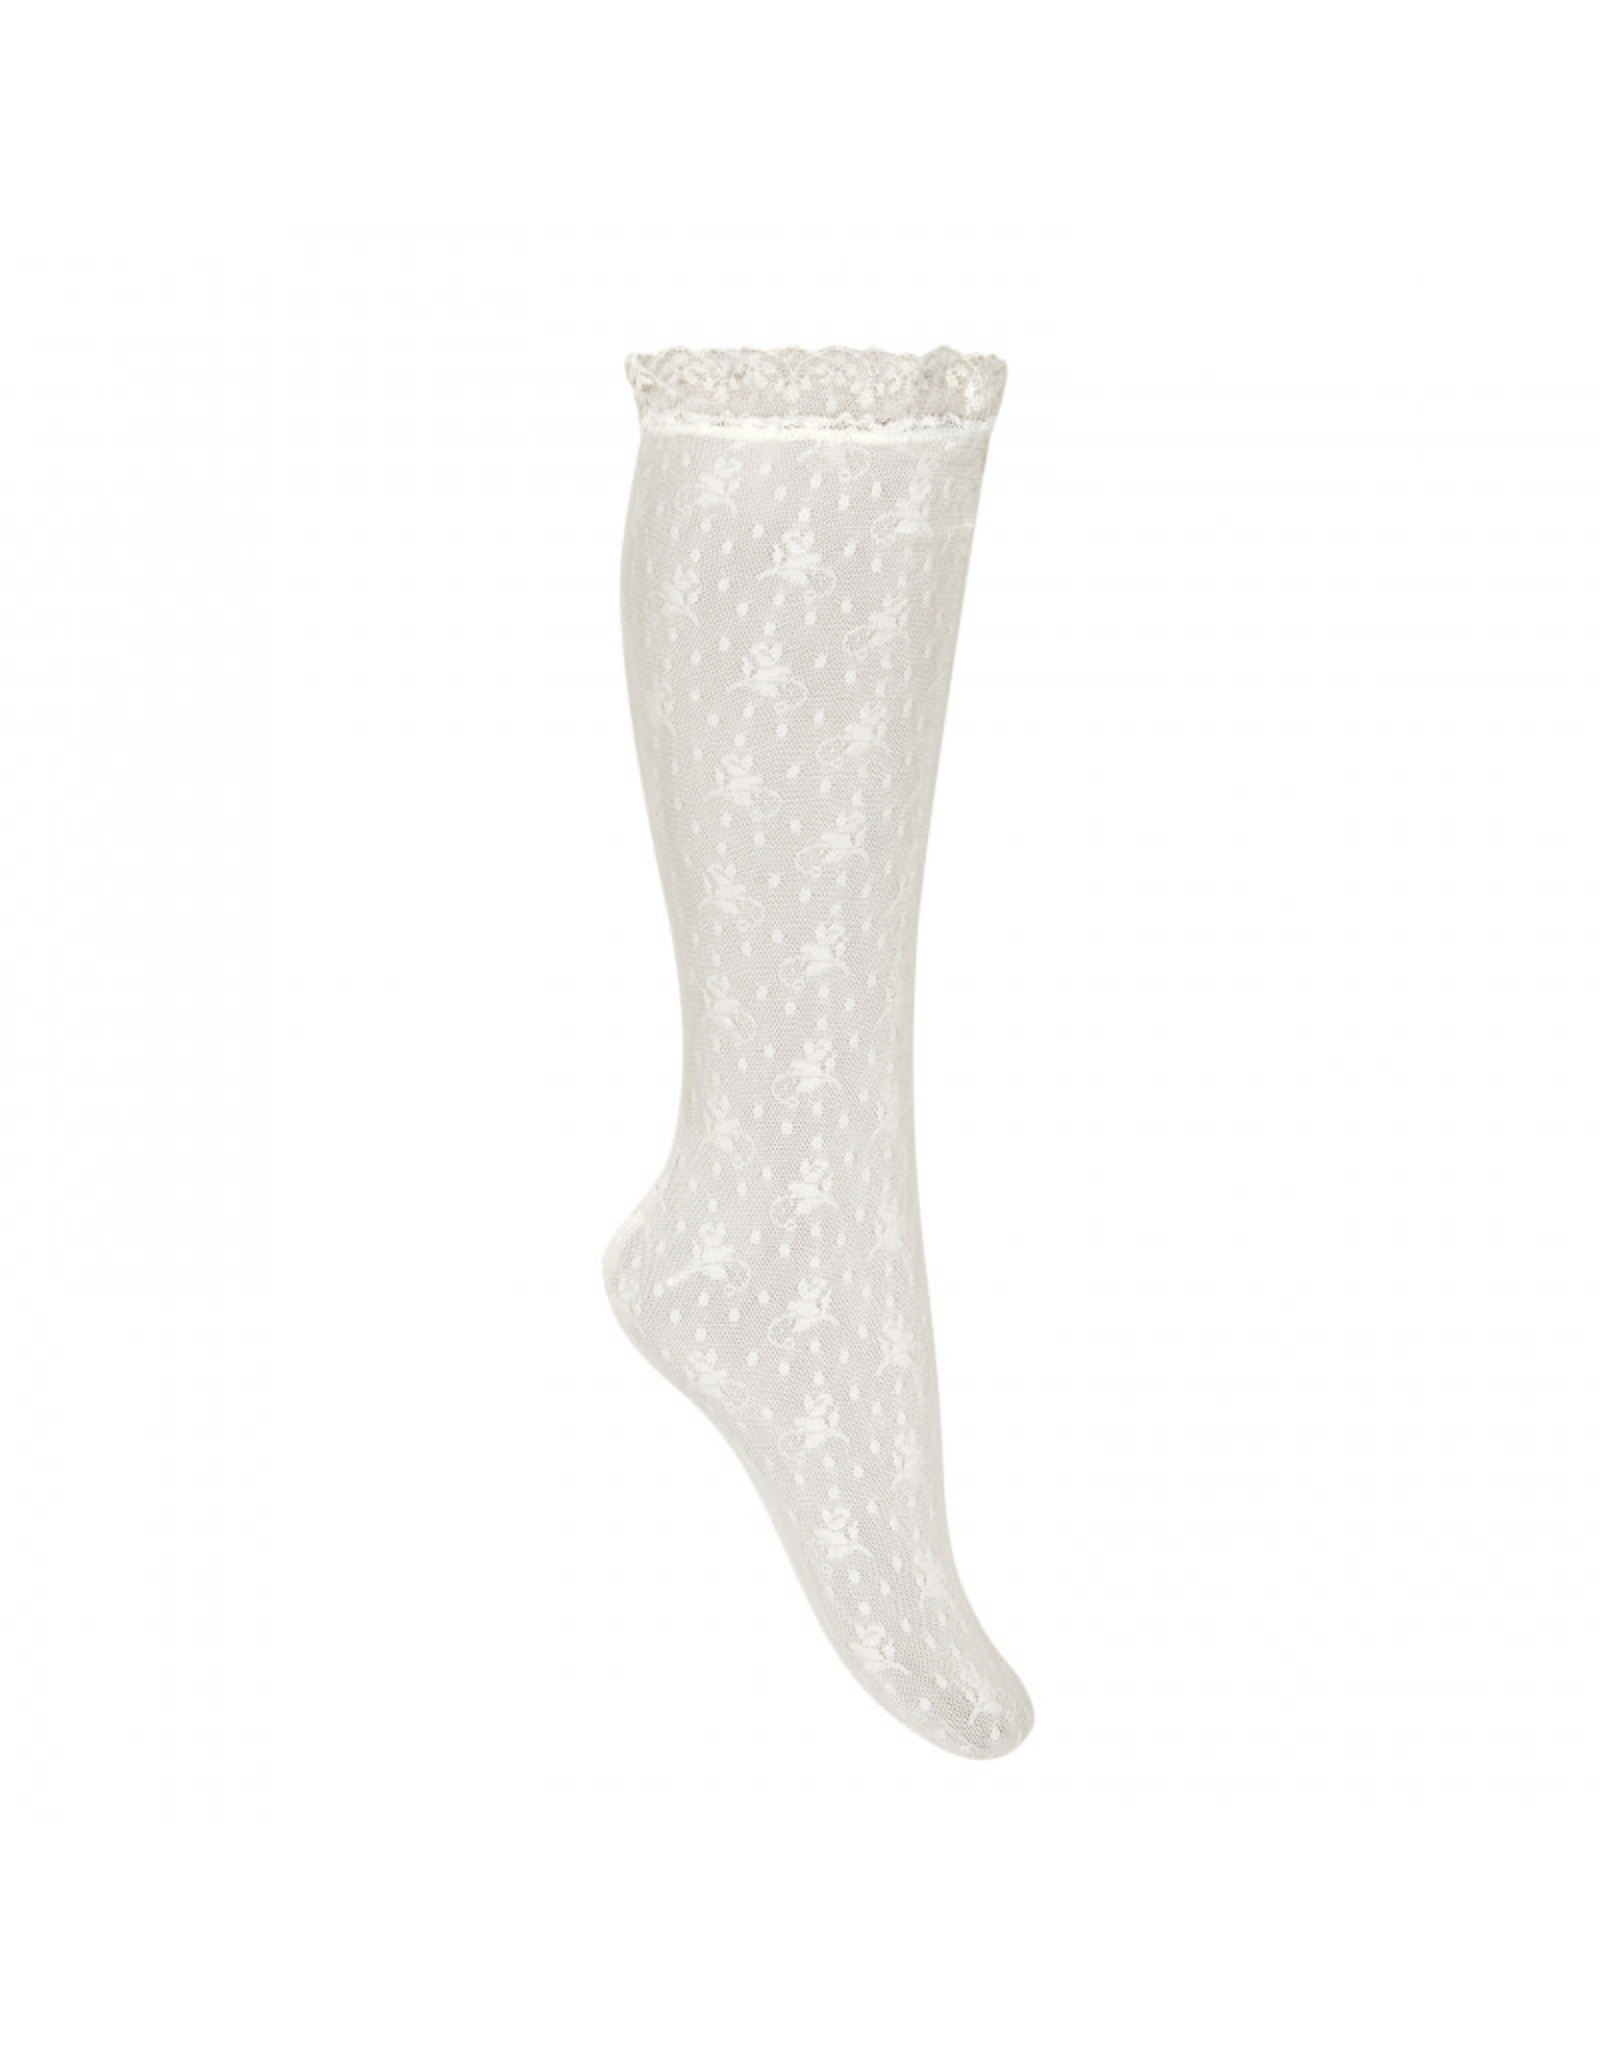 CONDOR White Lace Knee Socks